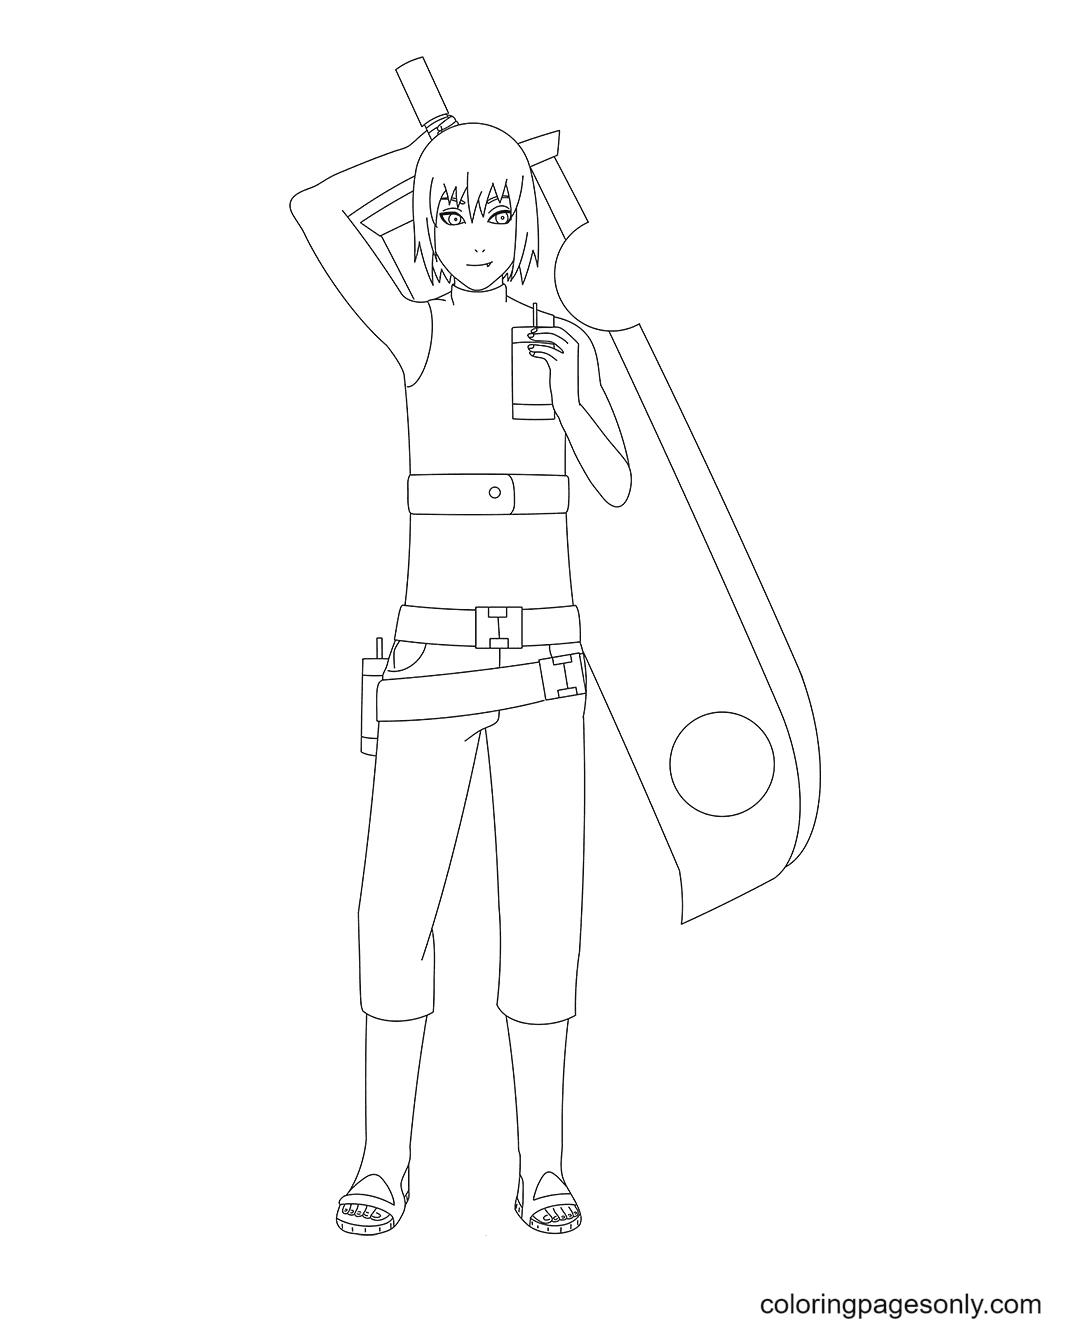 Suigetsu Hozuki with Sword Coloring Page